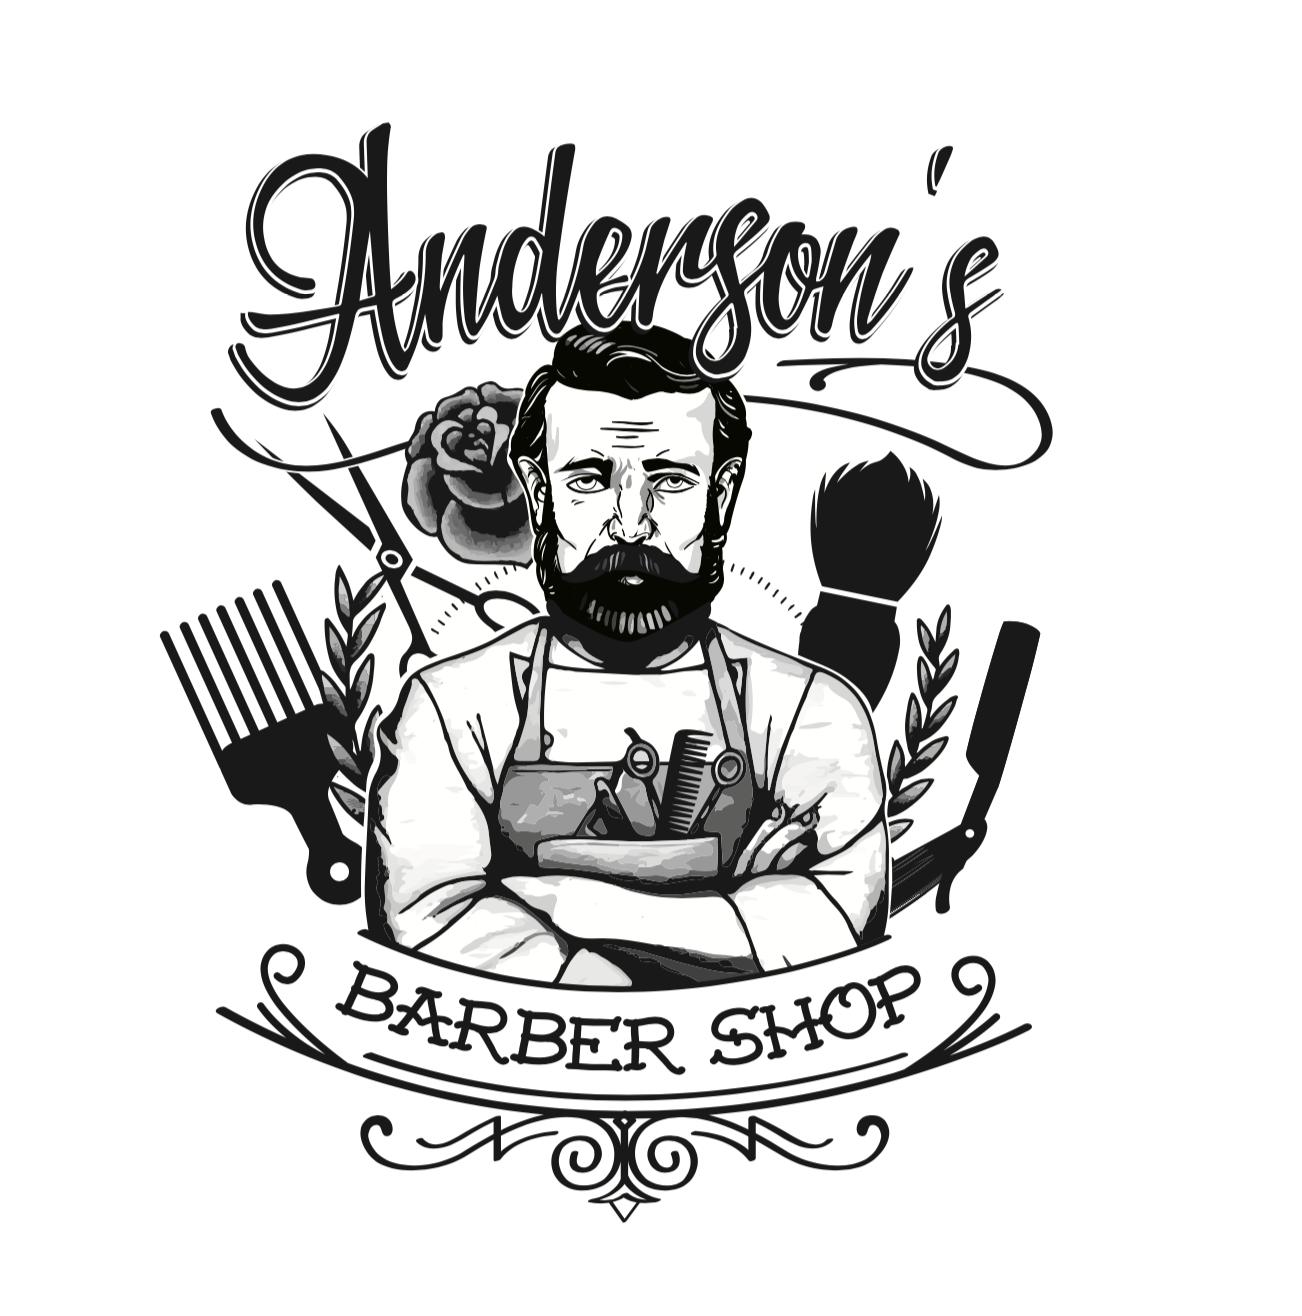 Anderson's Barber Shop by Dekree Studios